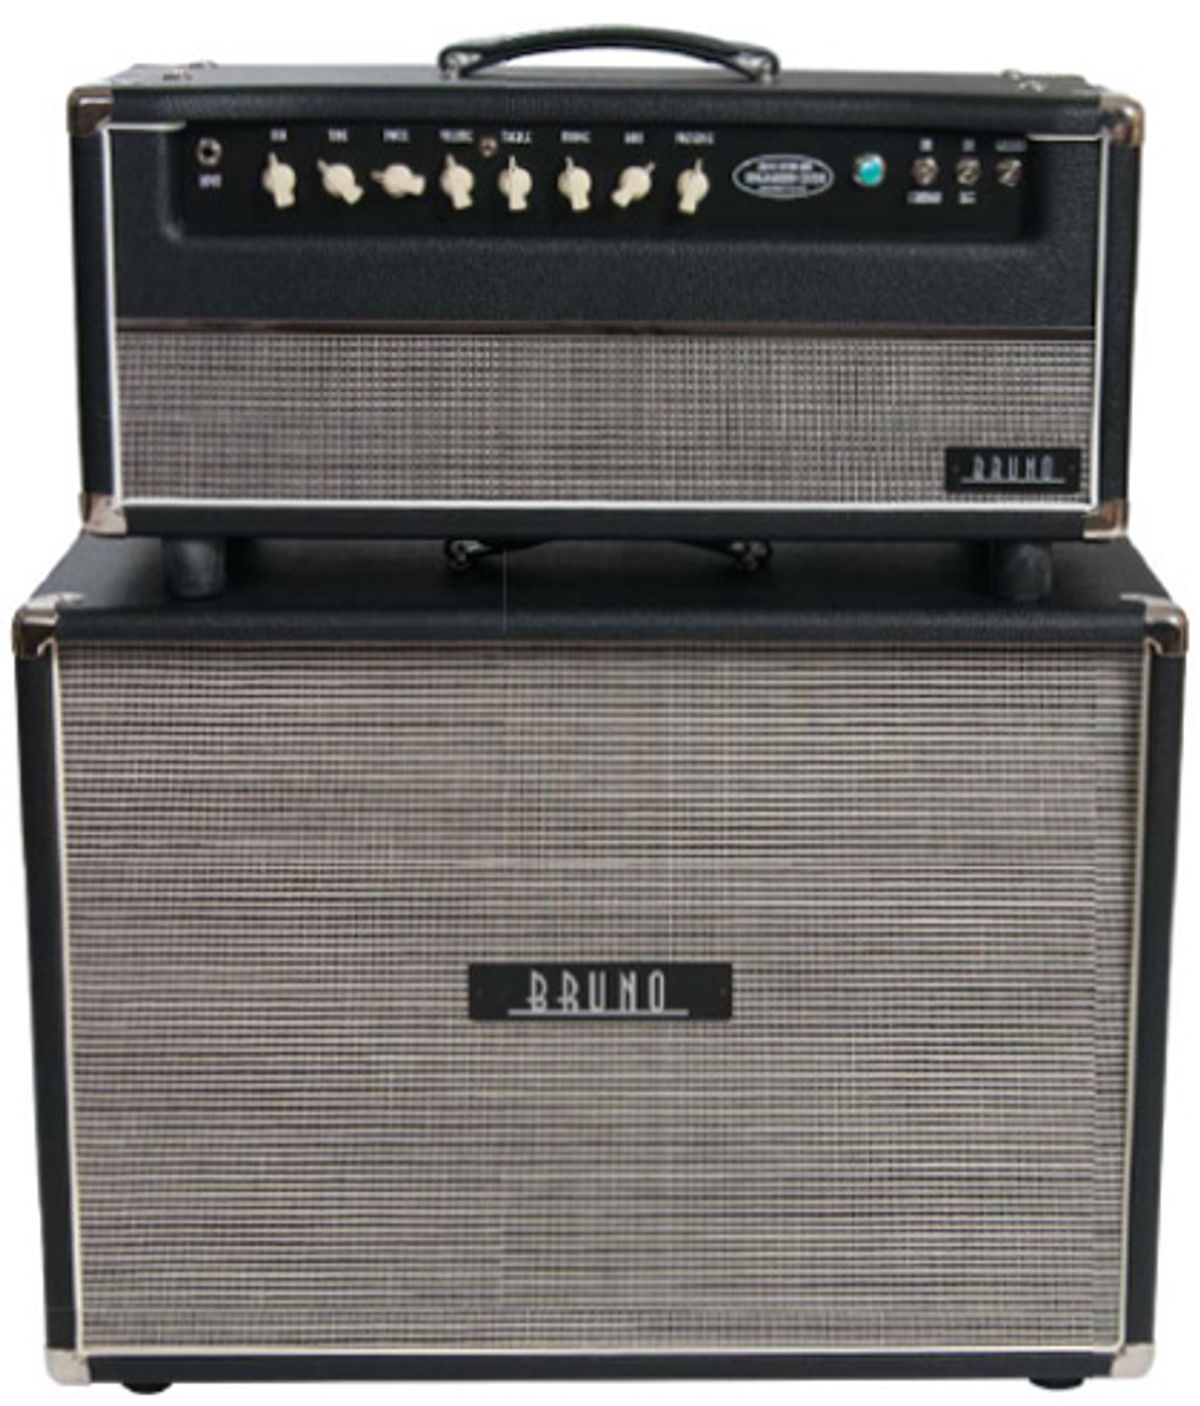 Tony Bruno Custom Amps Underground Custom Amp Review